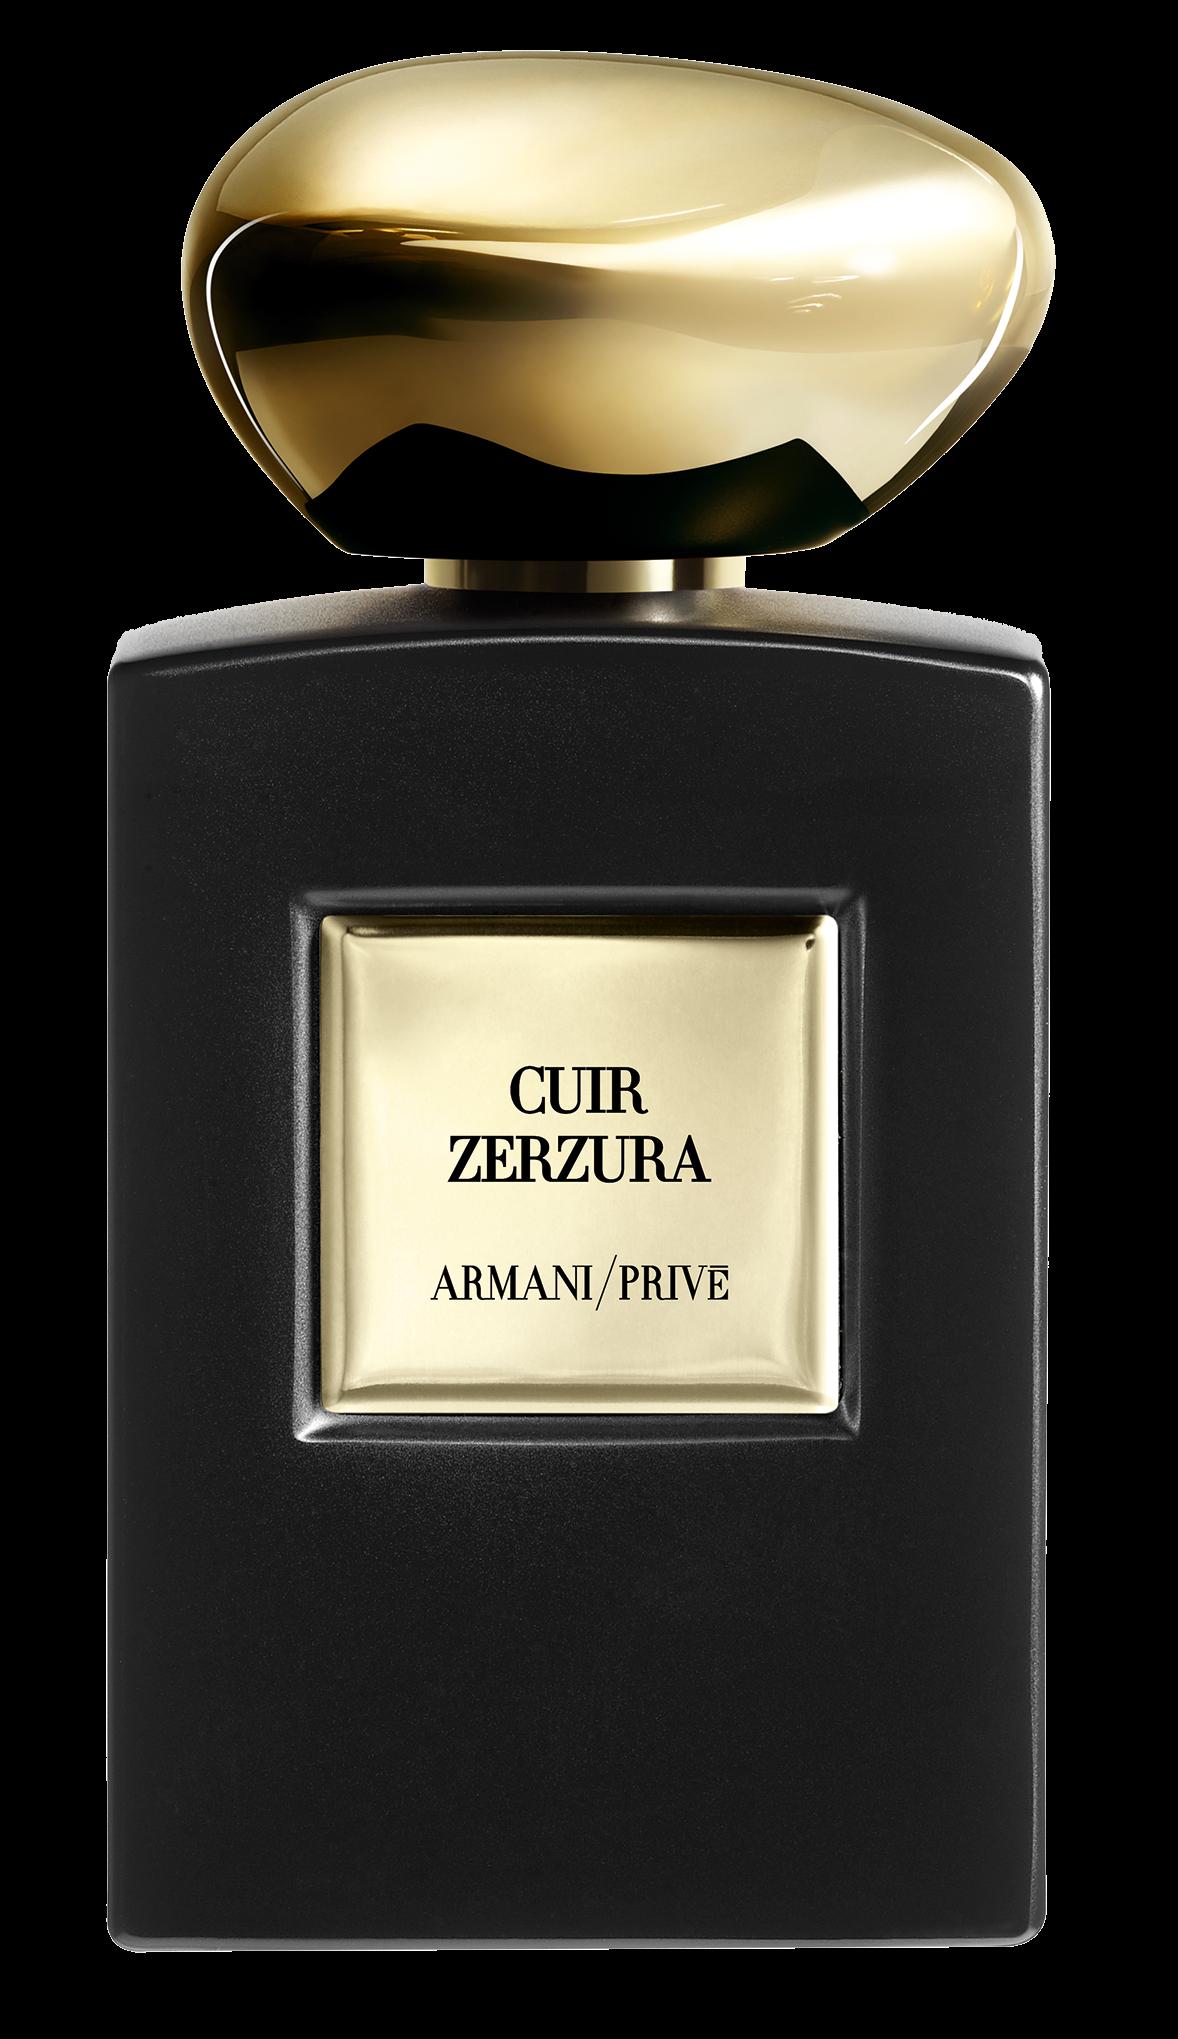 MENS_ARMANI_PRIVE_CUIR_ZERZURA.